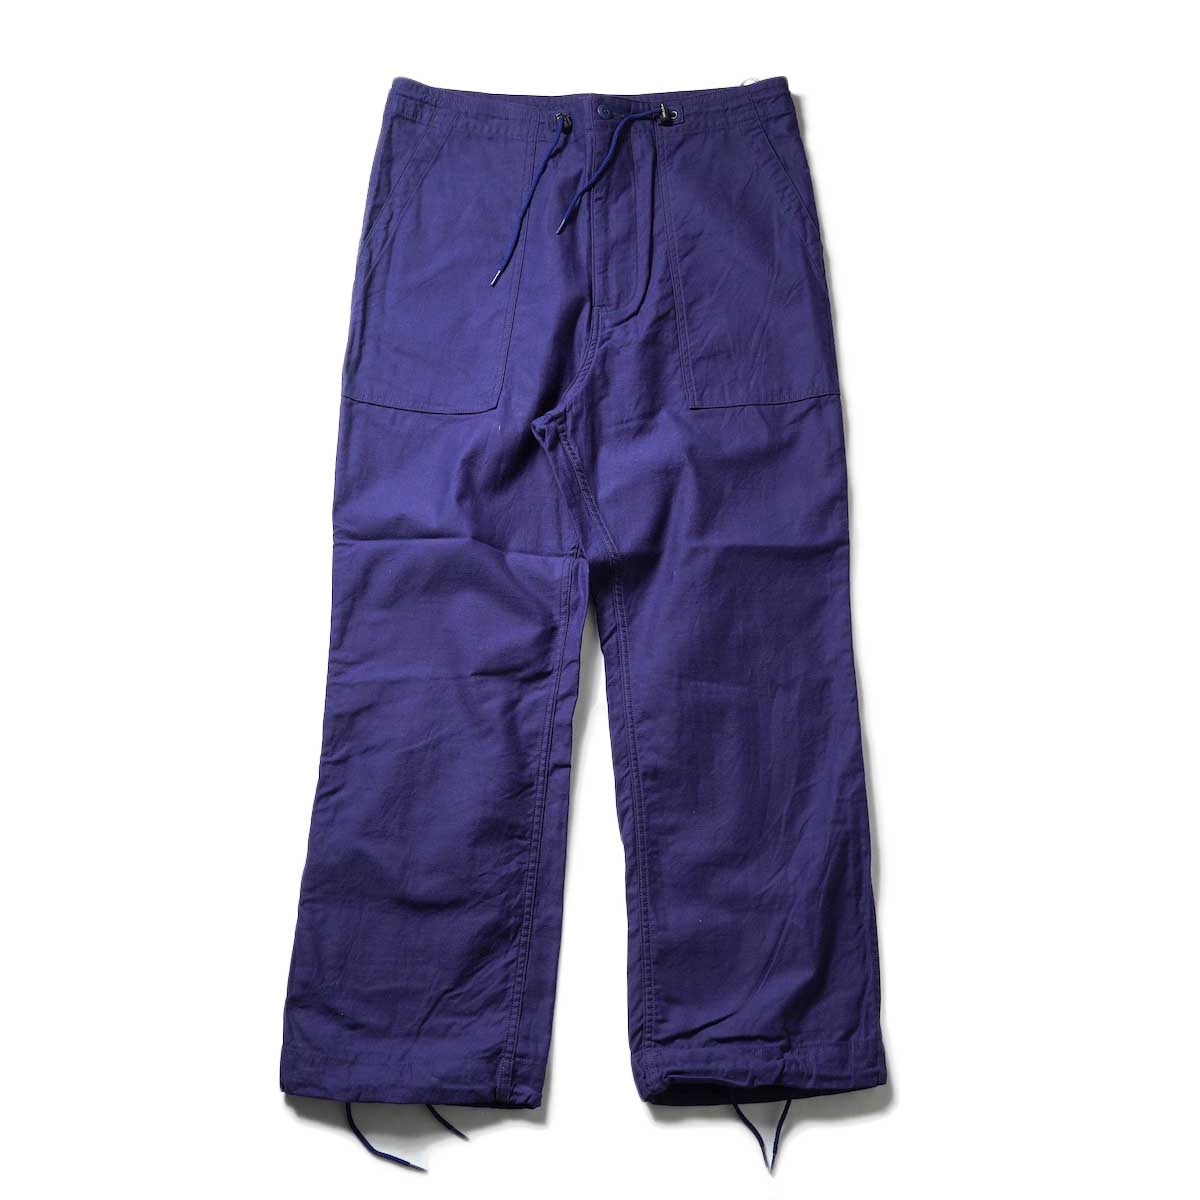 Needles / STRING FATIGUE PANT - BACK SATEEN (Navy)